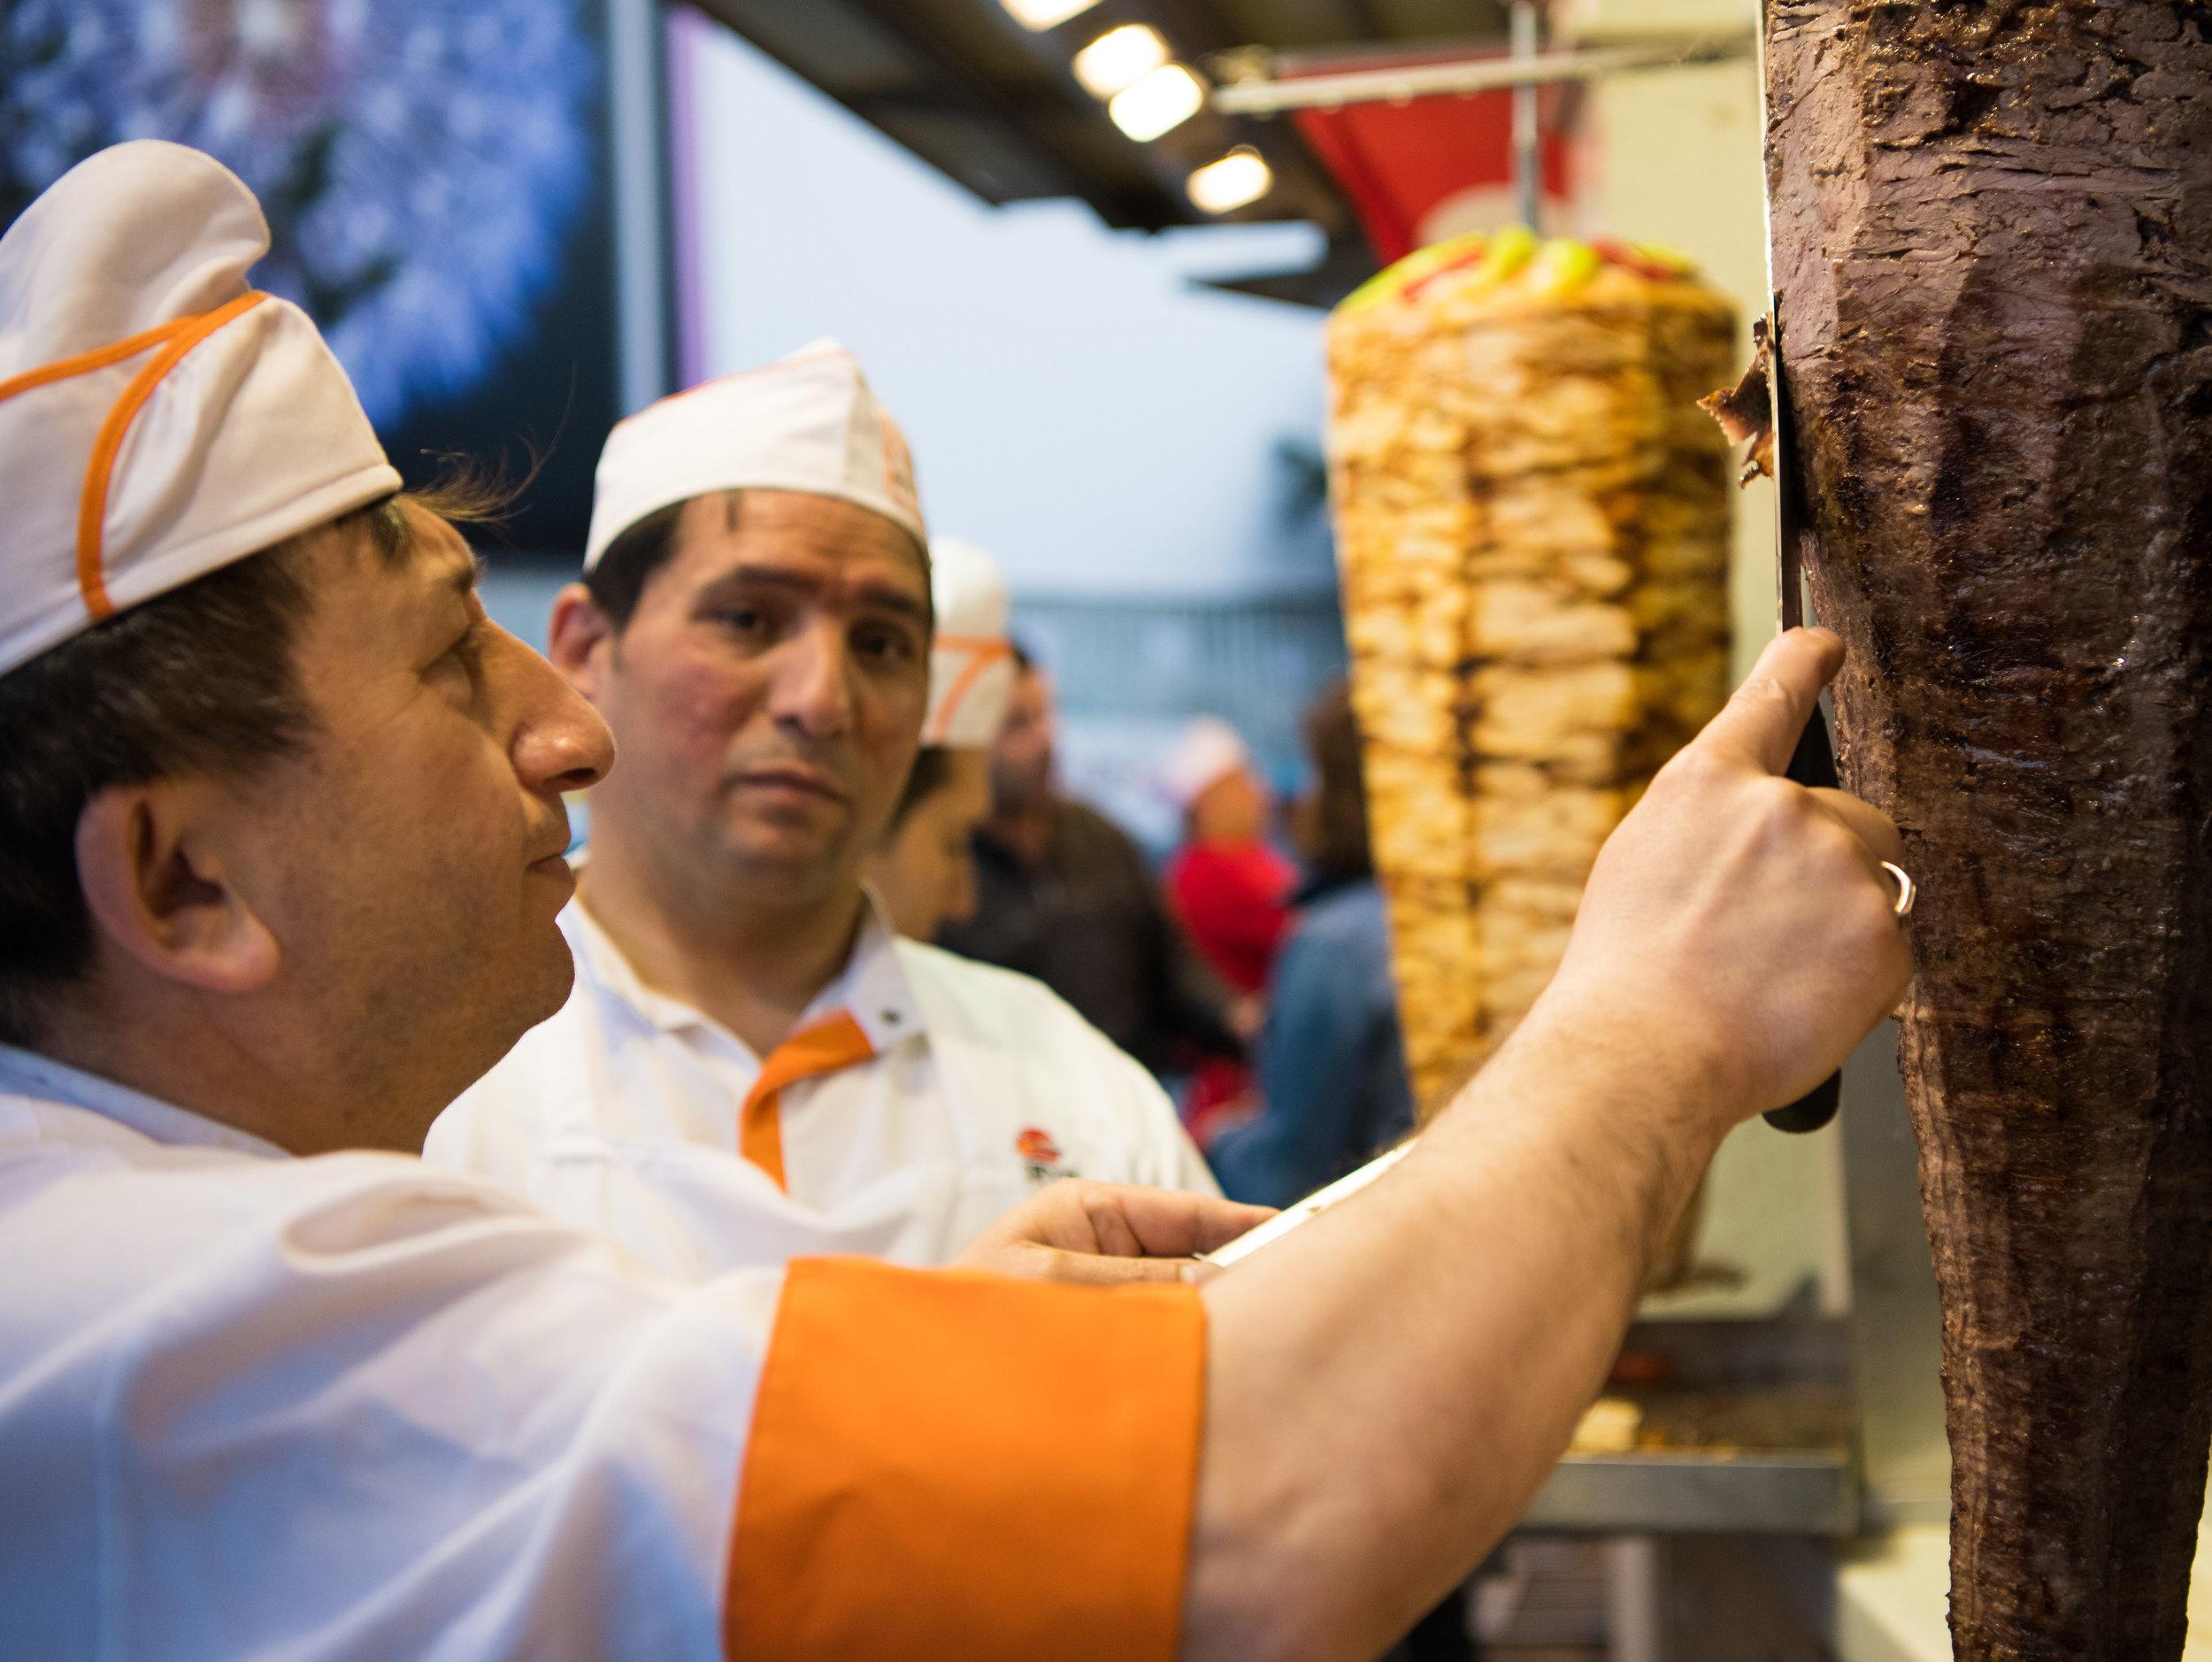 thetravelhub_istanbul_food-4005.jpg